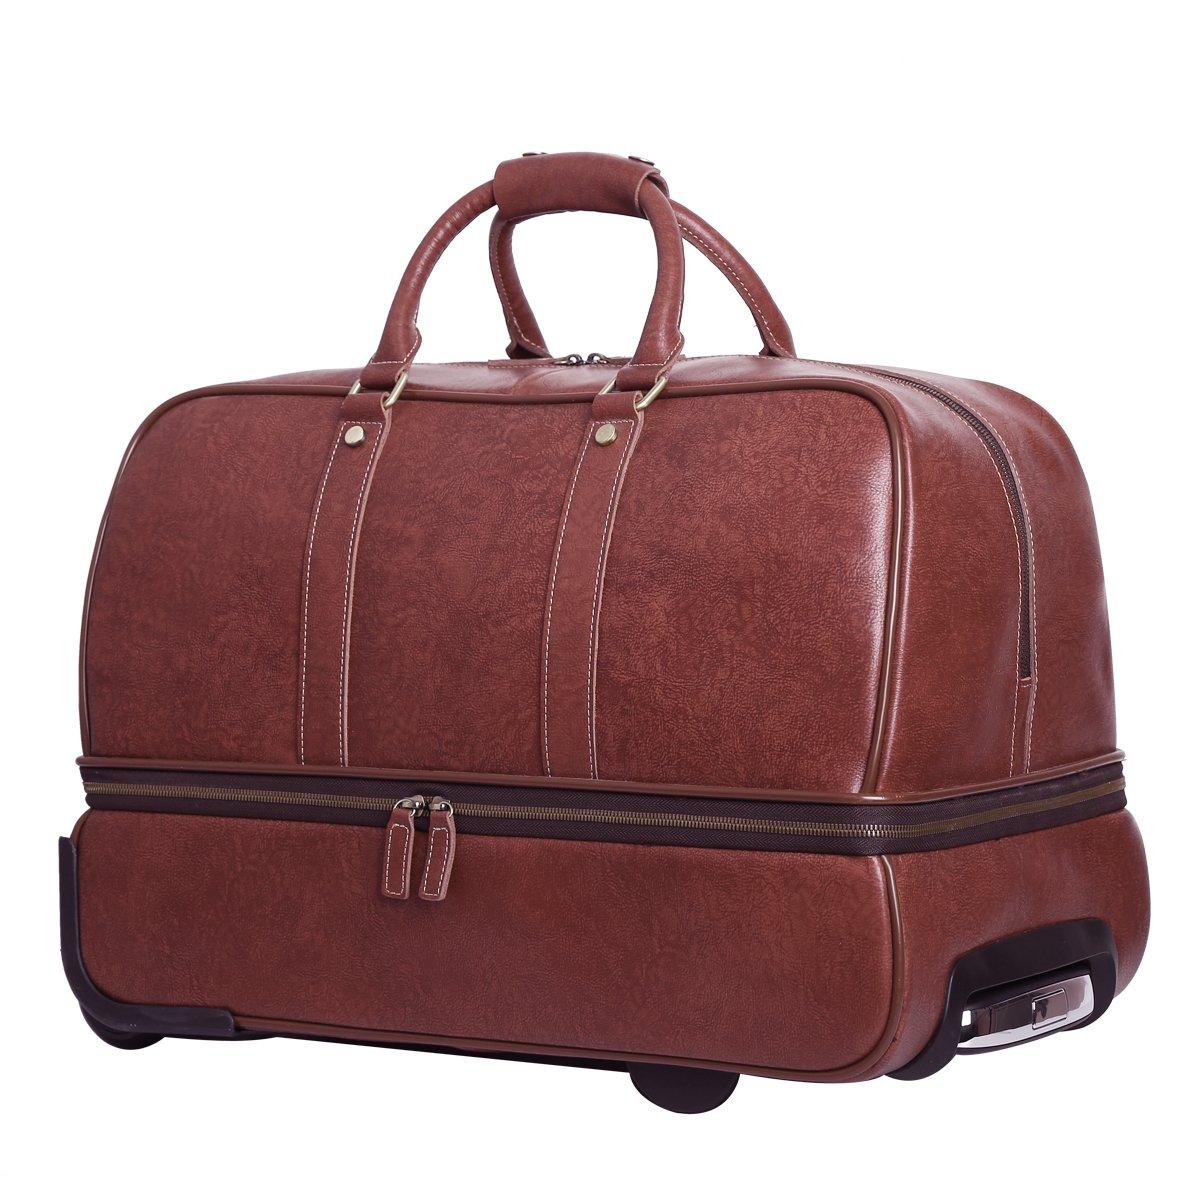 Leathario Leather Luggage travel duffle bag weekend overnight bag (Burgendy) by Leathario (Image #2)